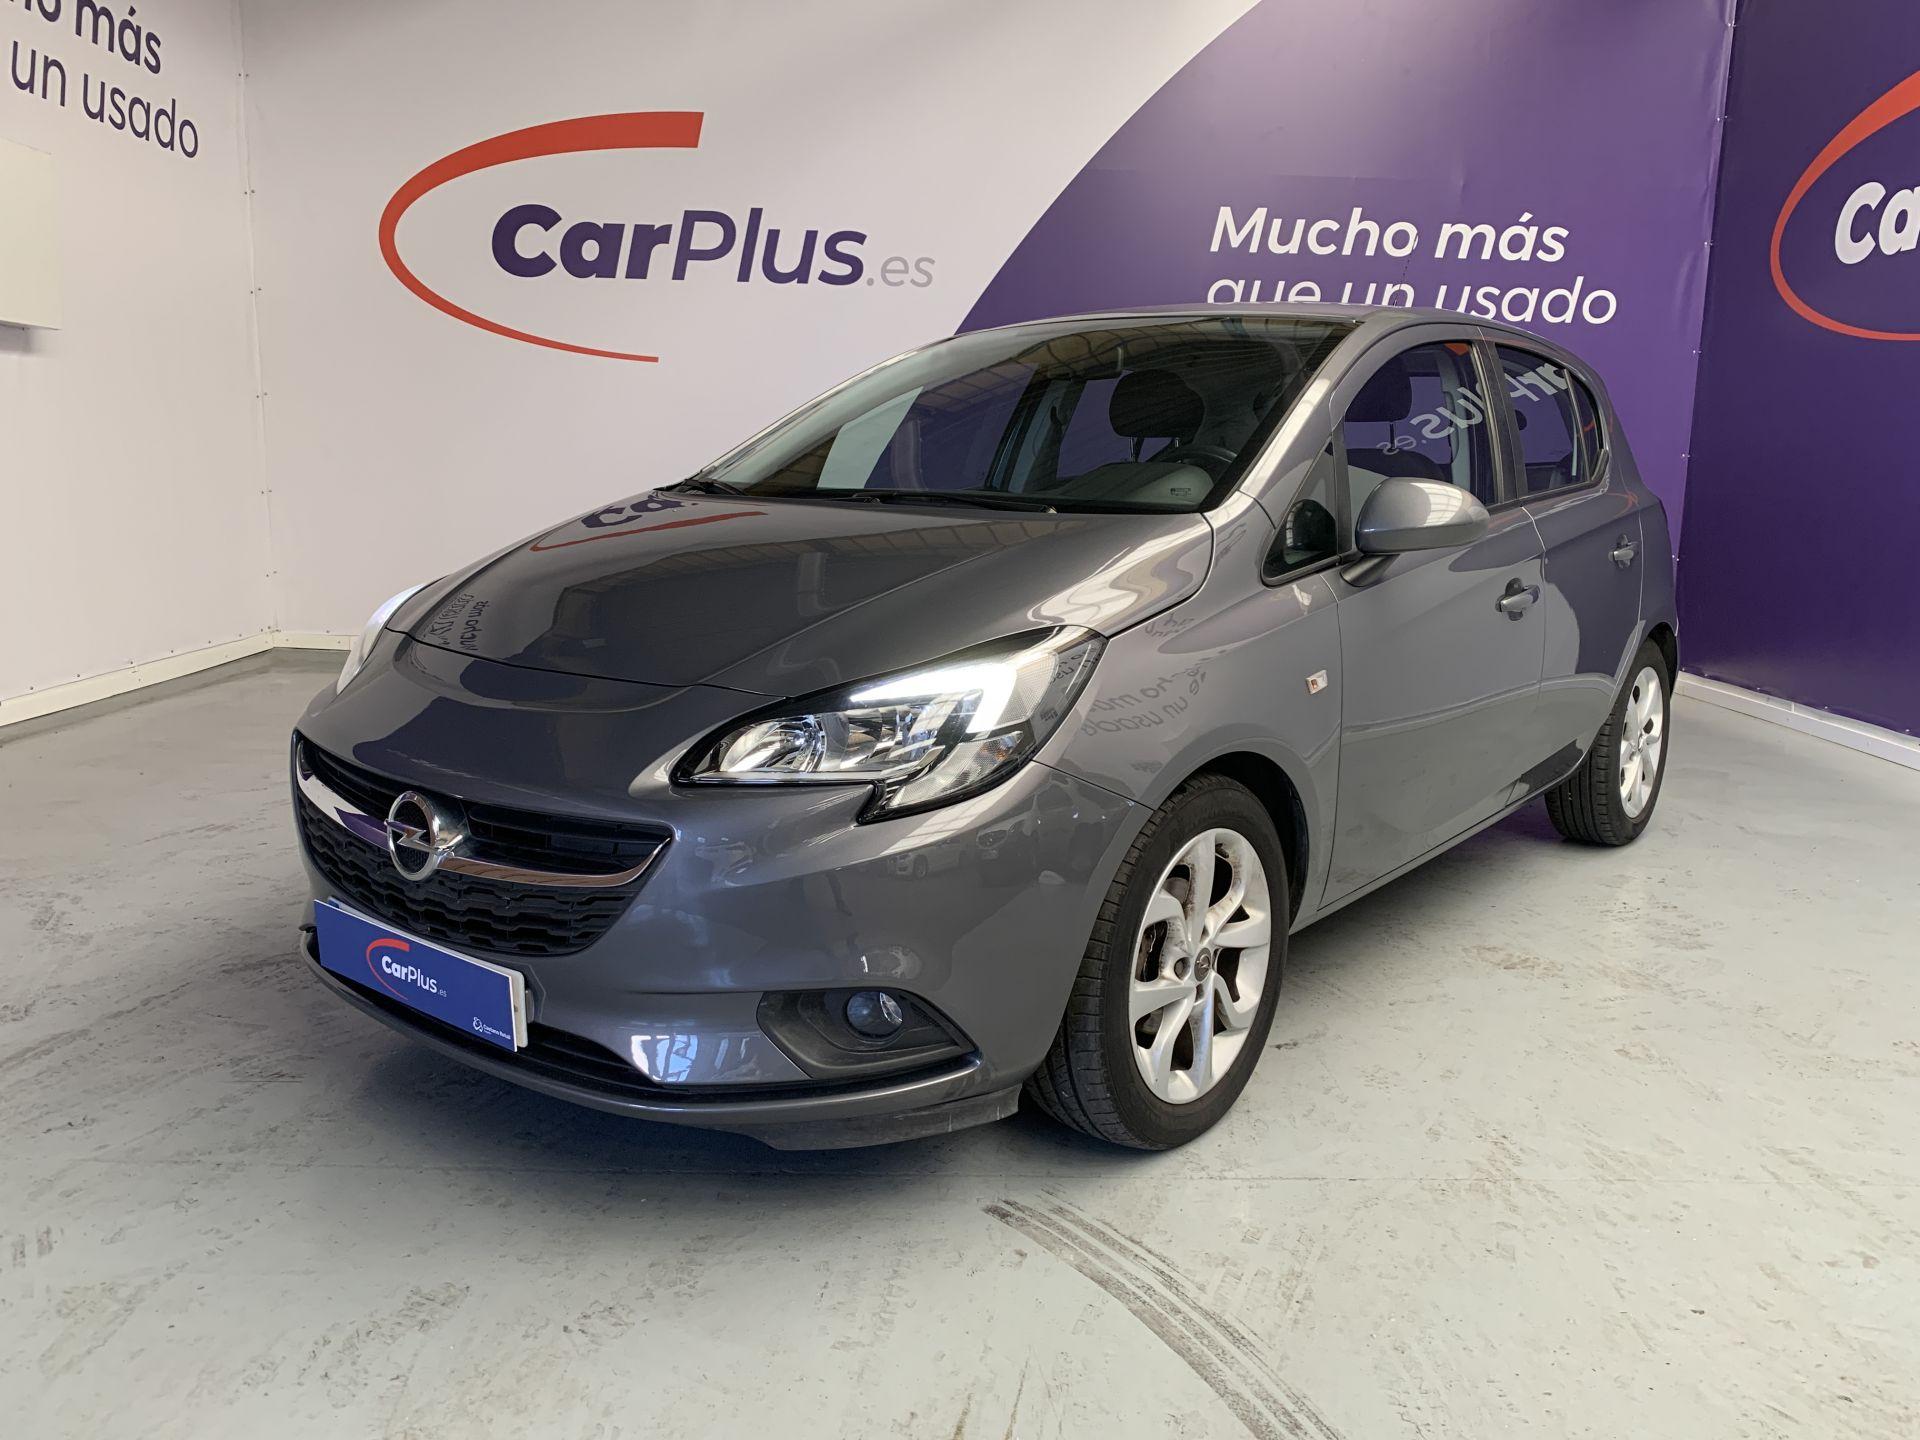 Opel Corsa 1.4 Excellence 90 CV segunda mano Madrid